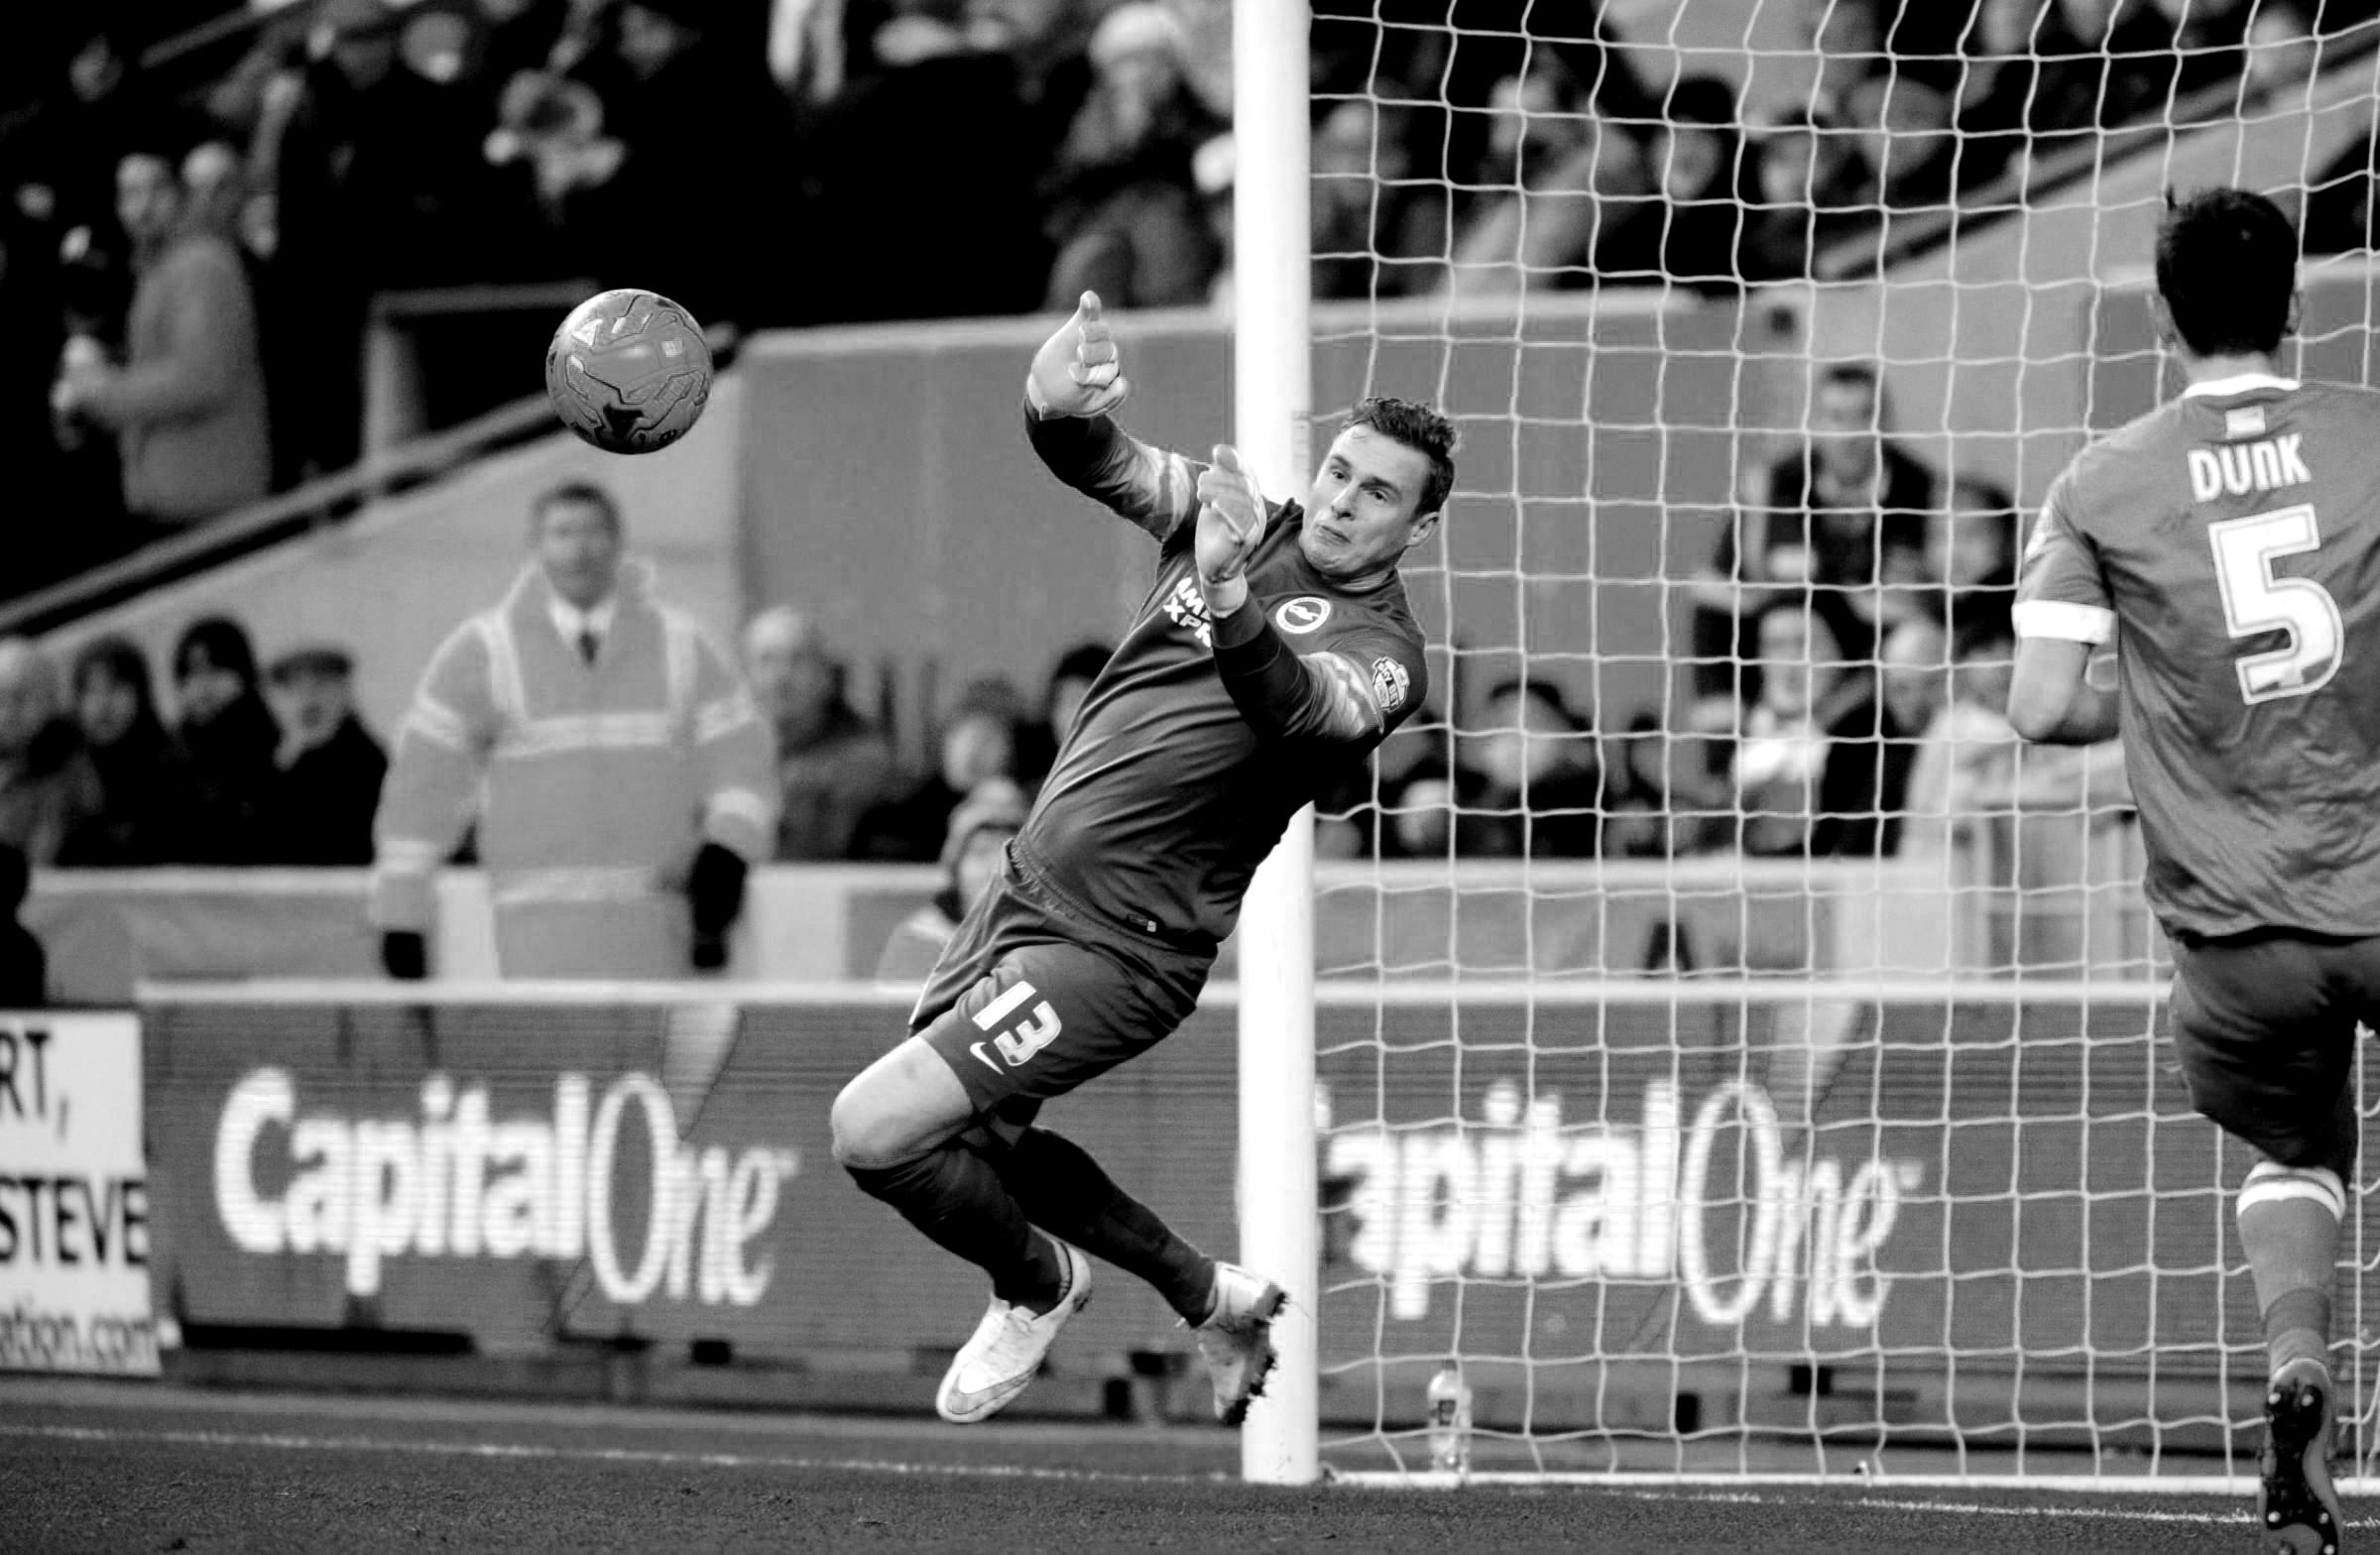 David Stockdale saving a football